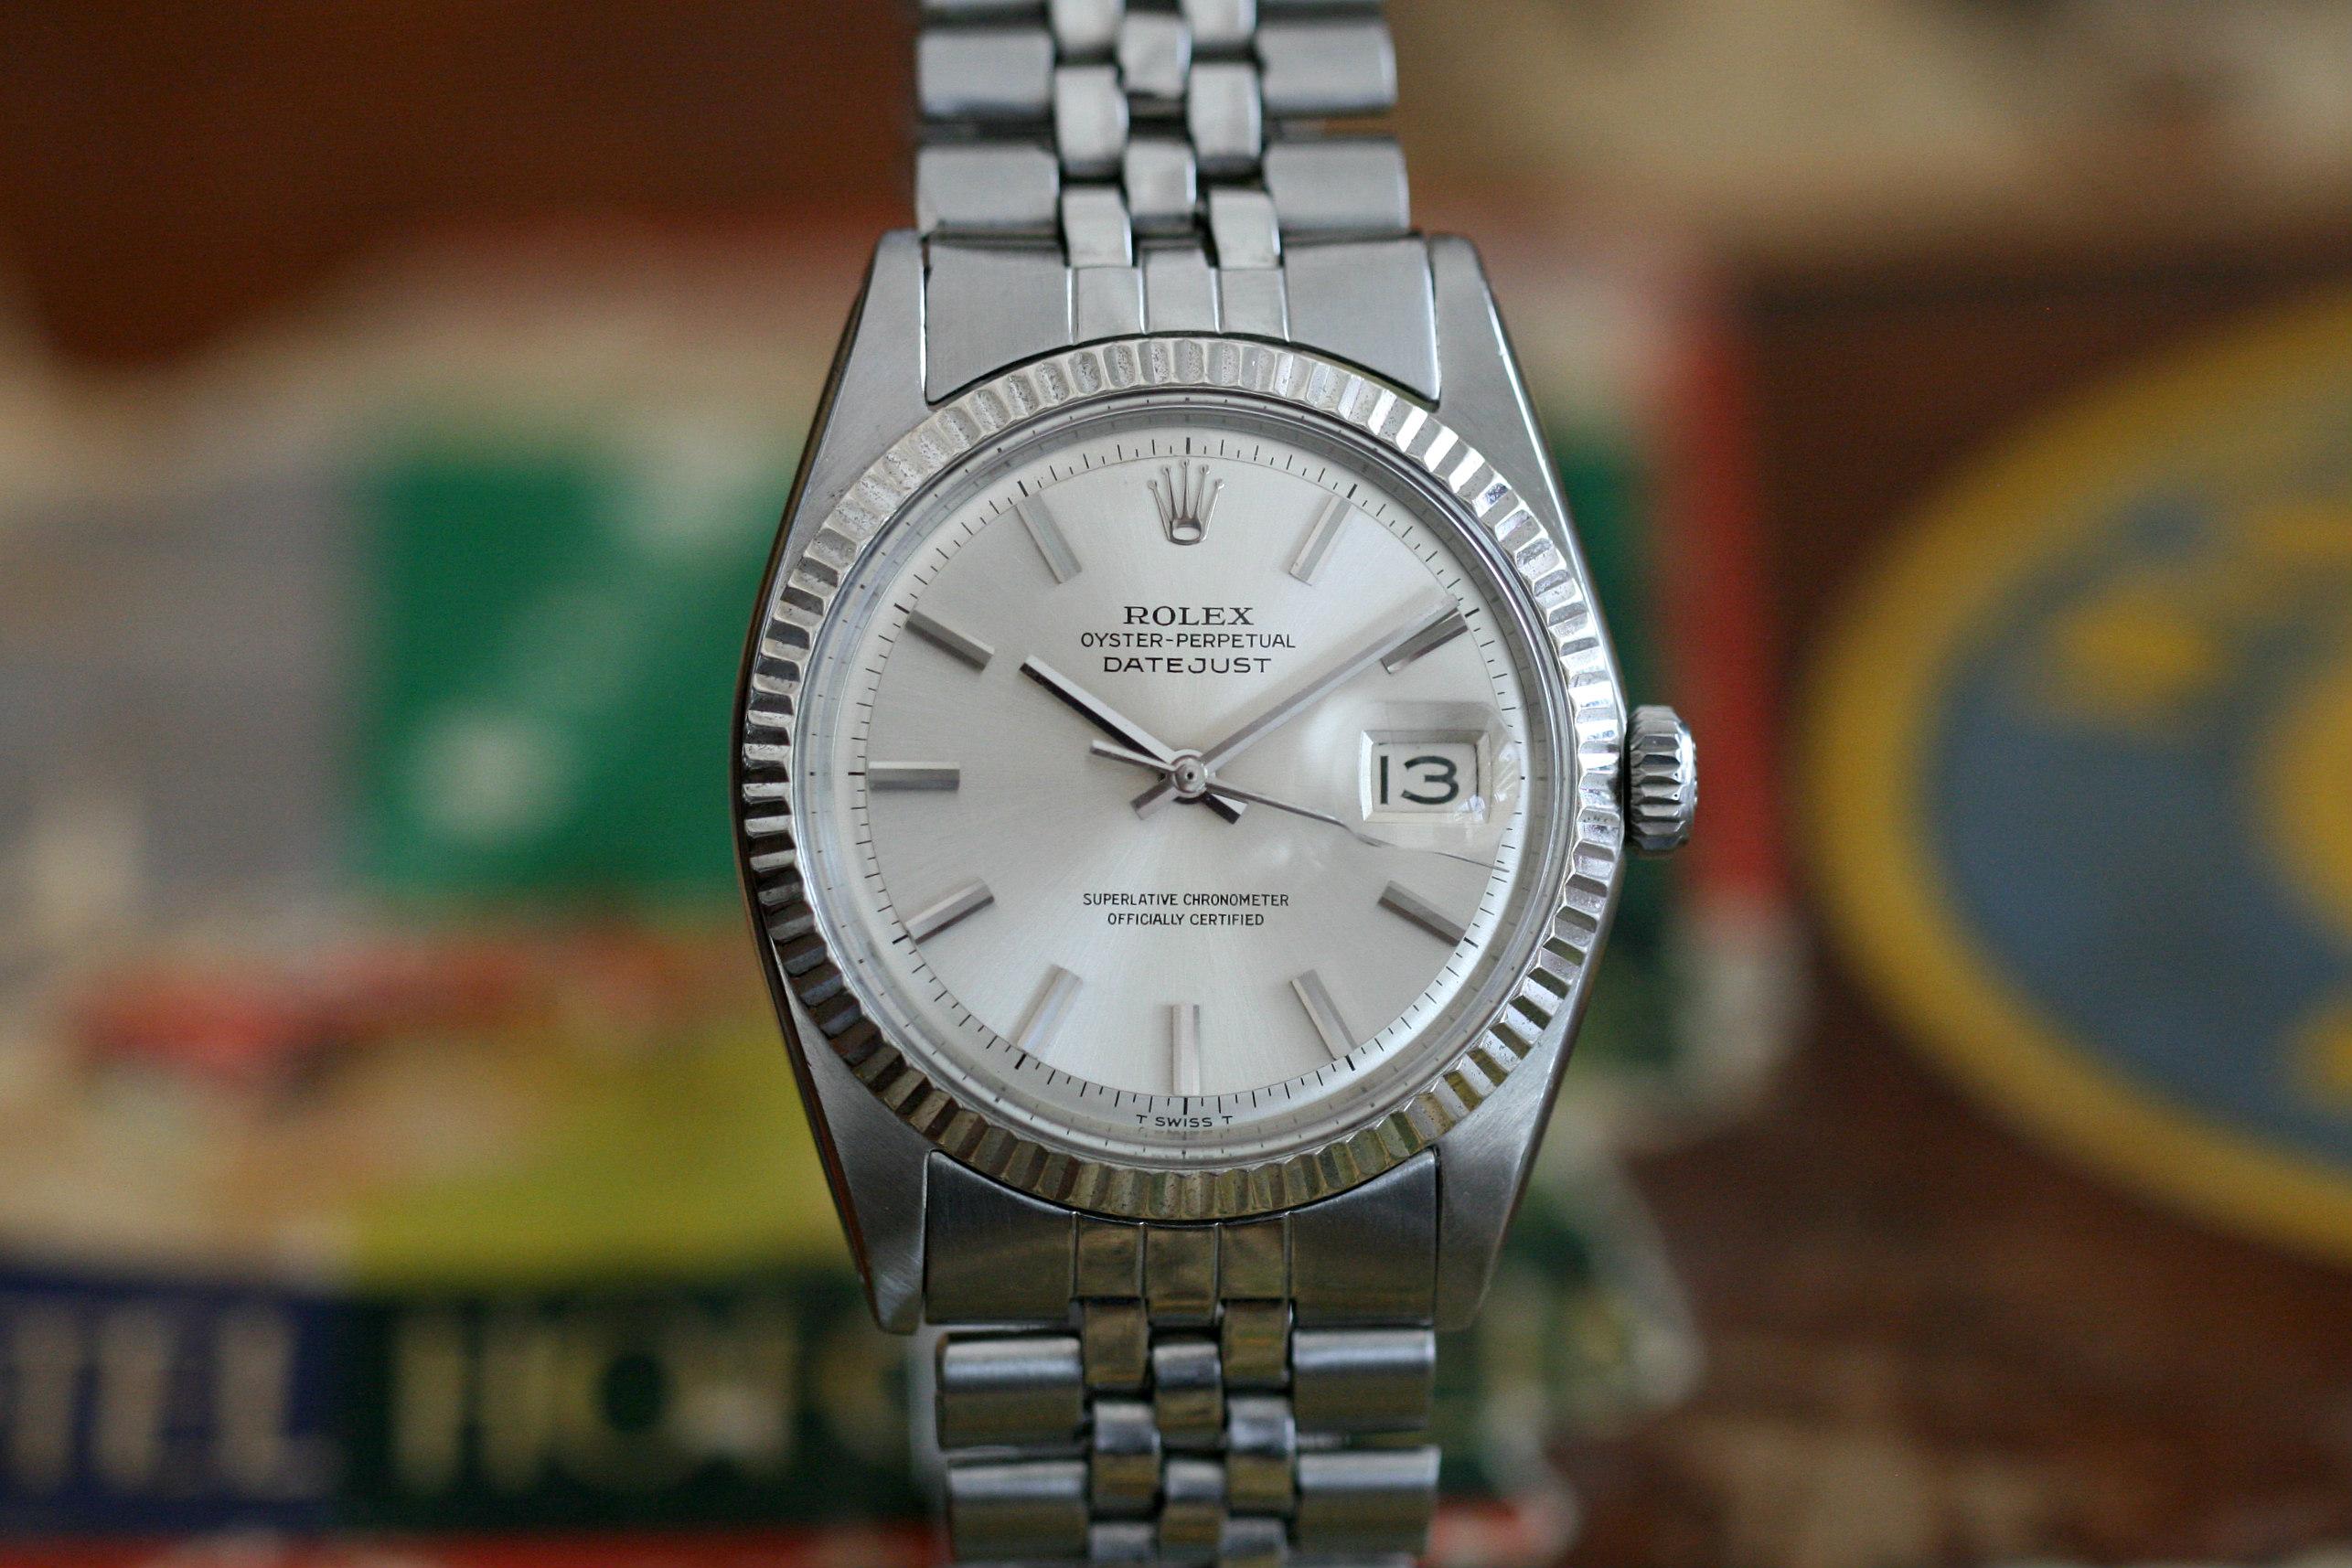 Rolex Datejust 1601 Bj. 1966